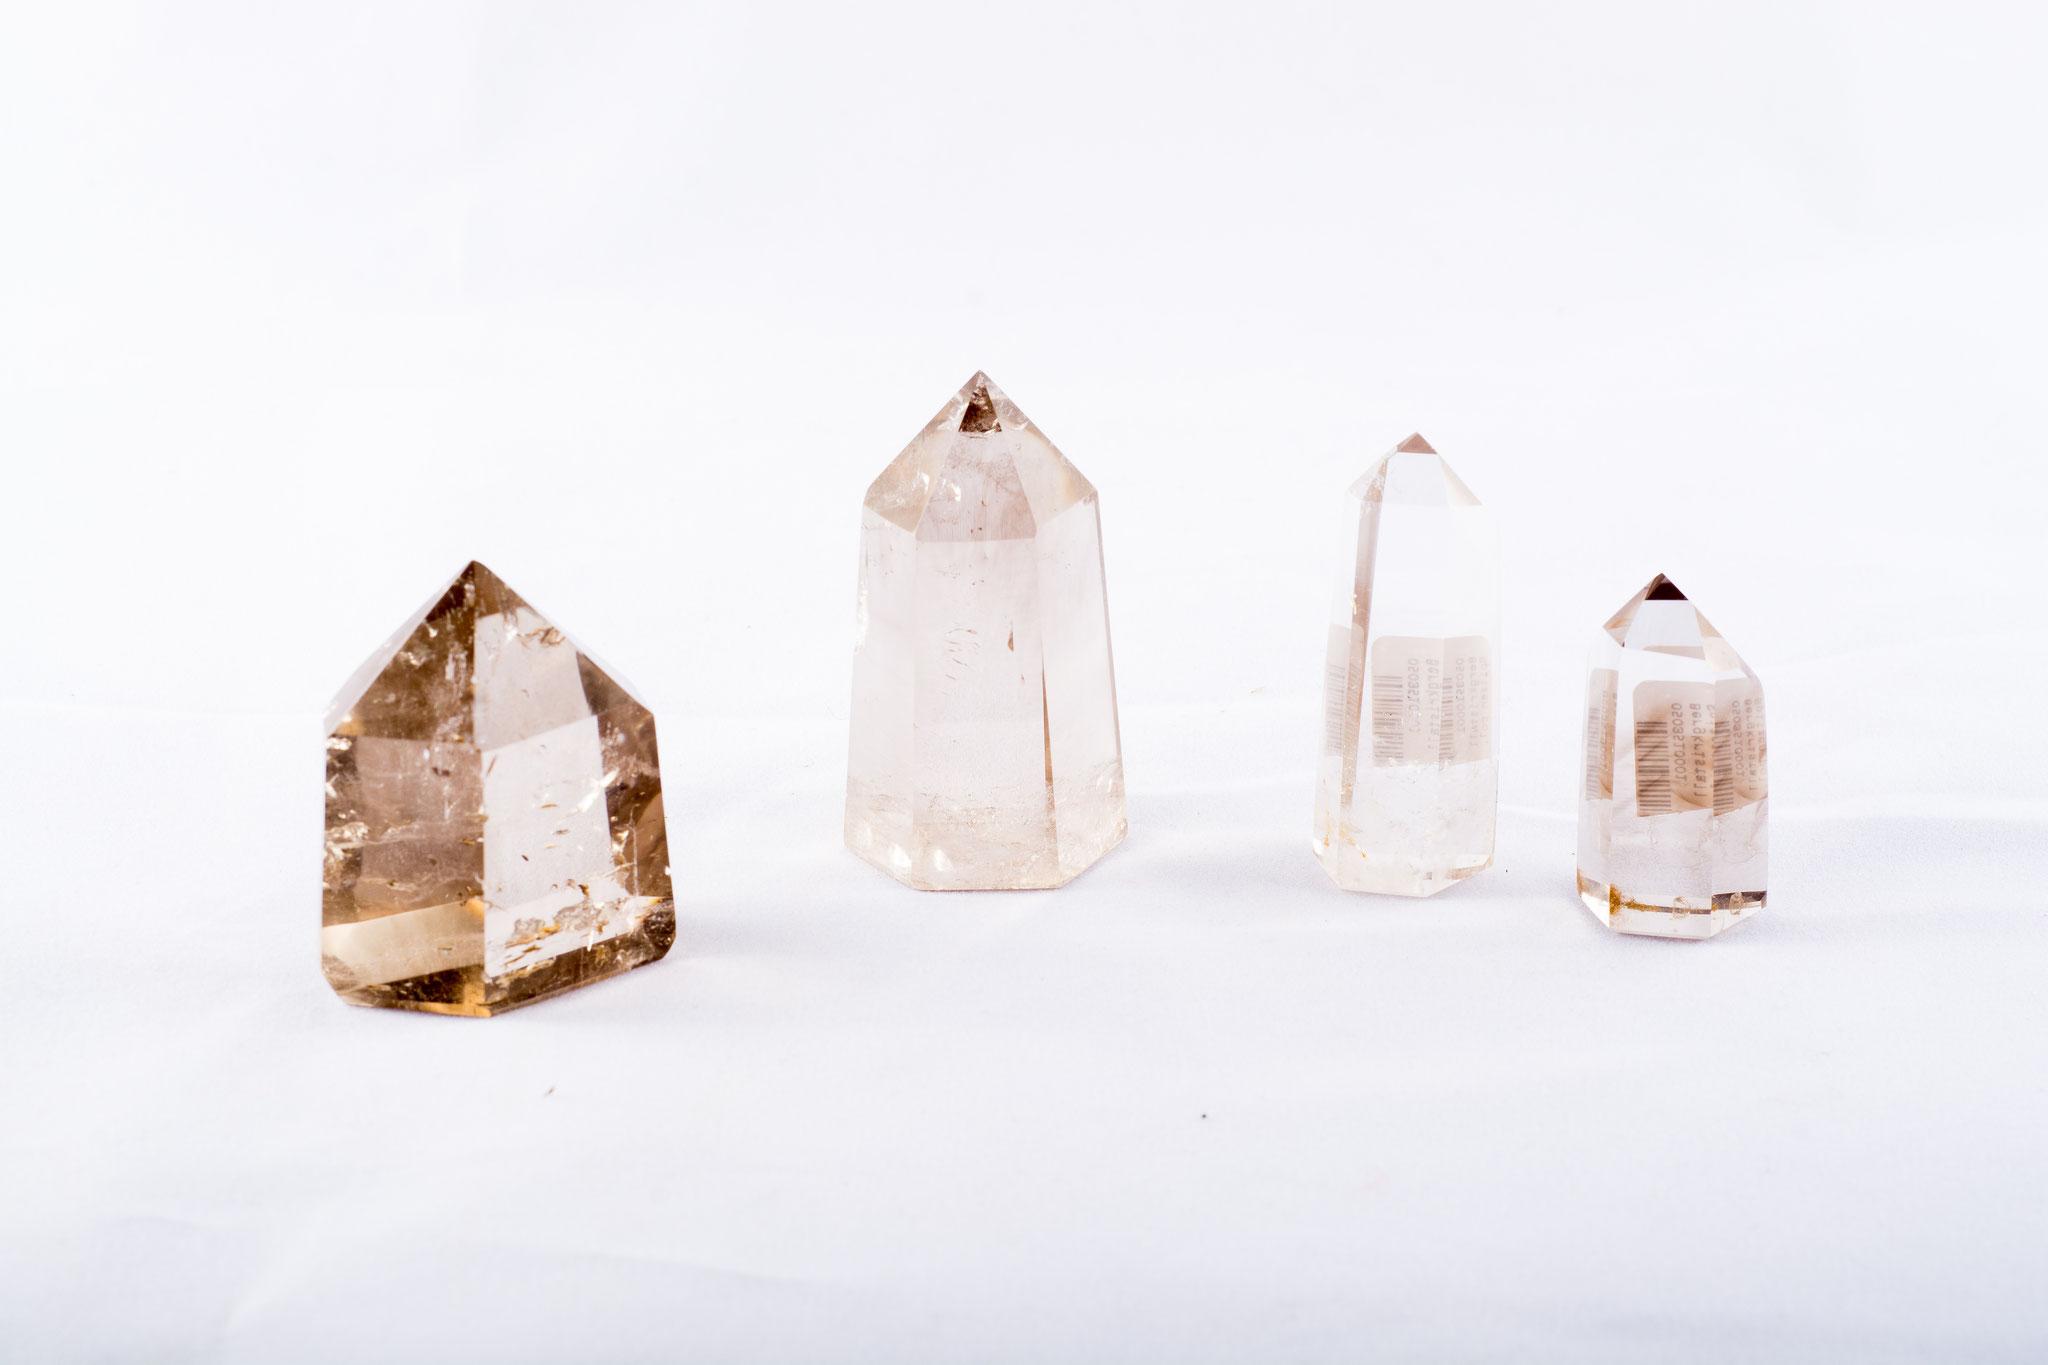 Kristallspitzen